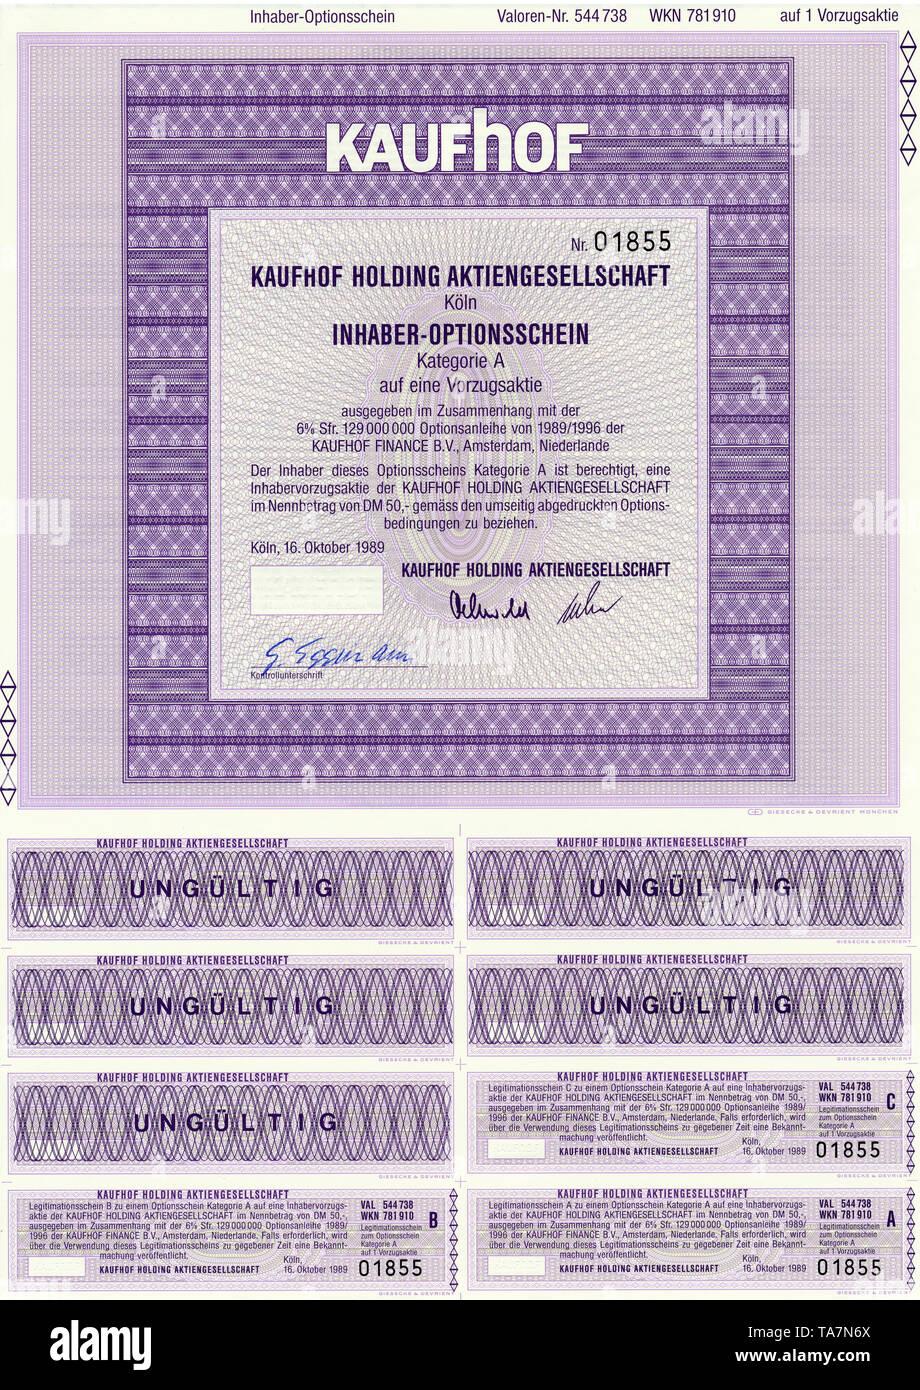 Historic stock certificate, Securities certificate, bearer warrant, Germany, Historisches Wertpapier, Inhaber-Optionsschein, Kaufhof Holding Aktiengesellschaft, 1989, Köln, Deutschland, Europa - Stock Image